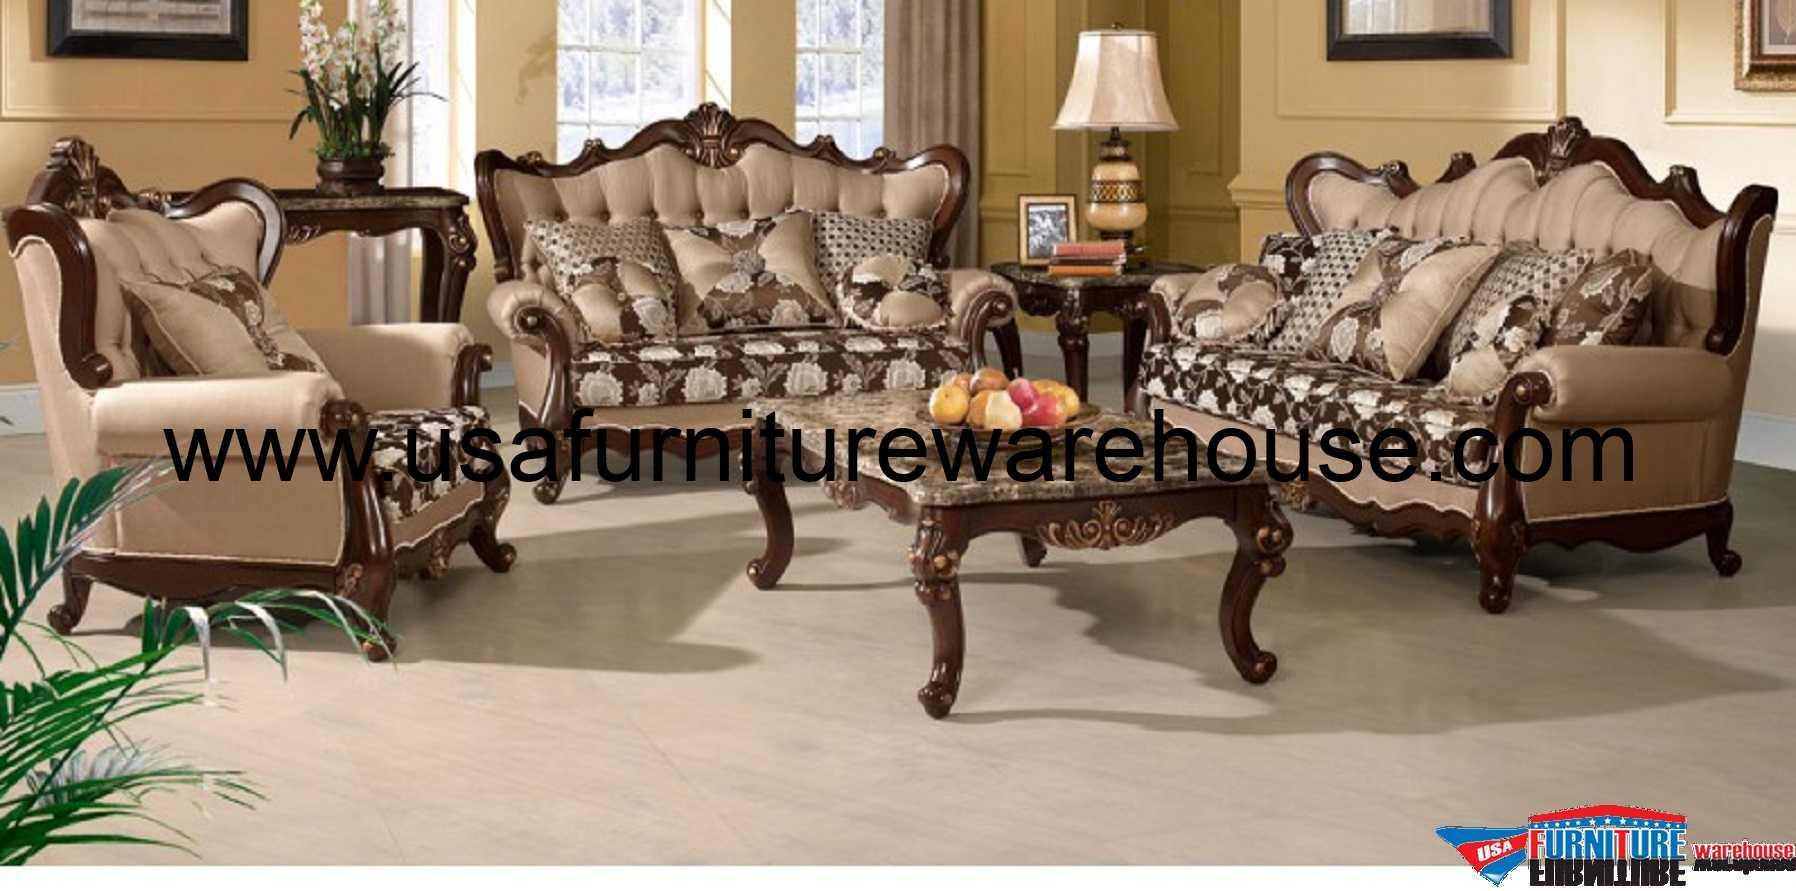 3 Piece Sophie Wood Trim Fabric Sofa Set Usa Furniture Warehouse